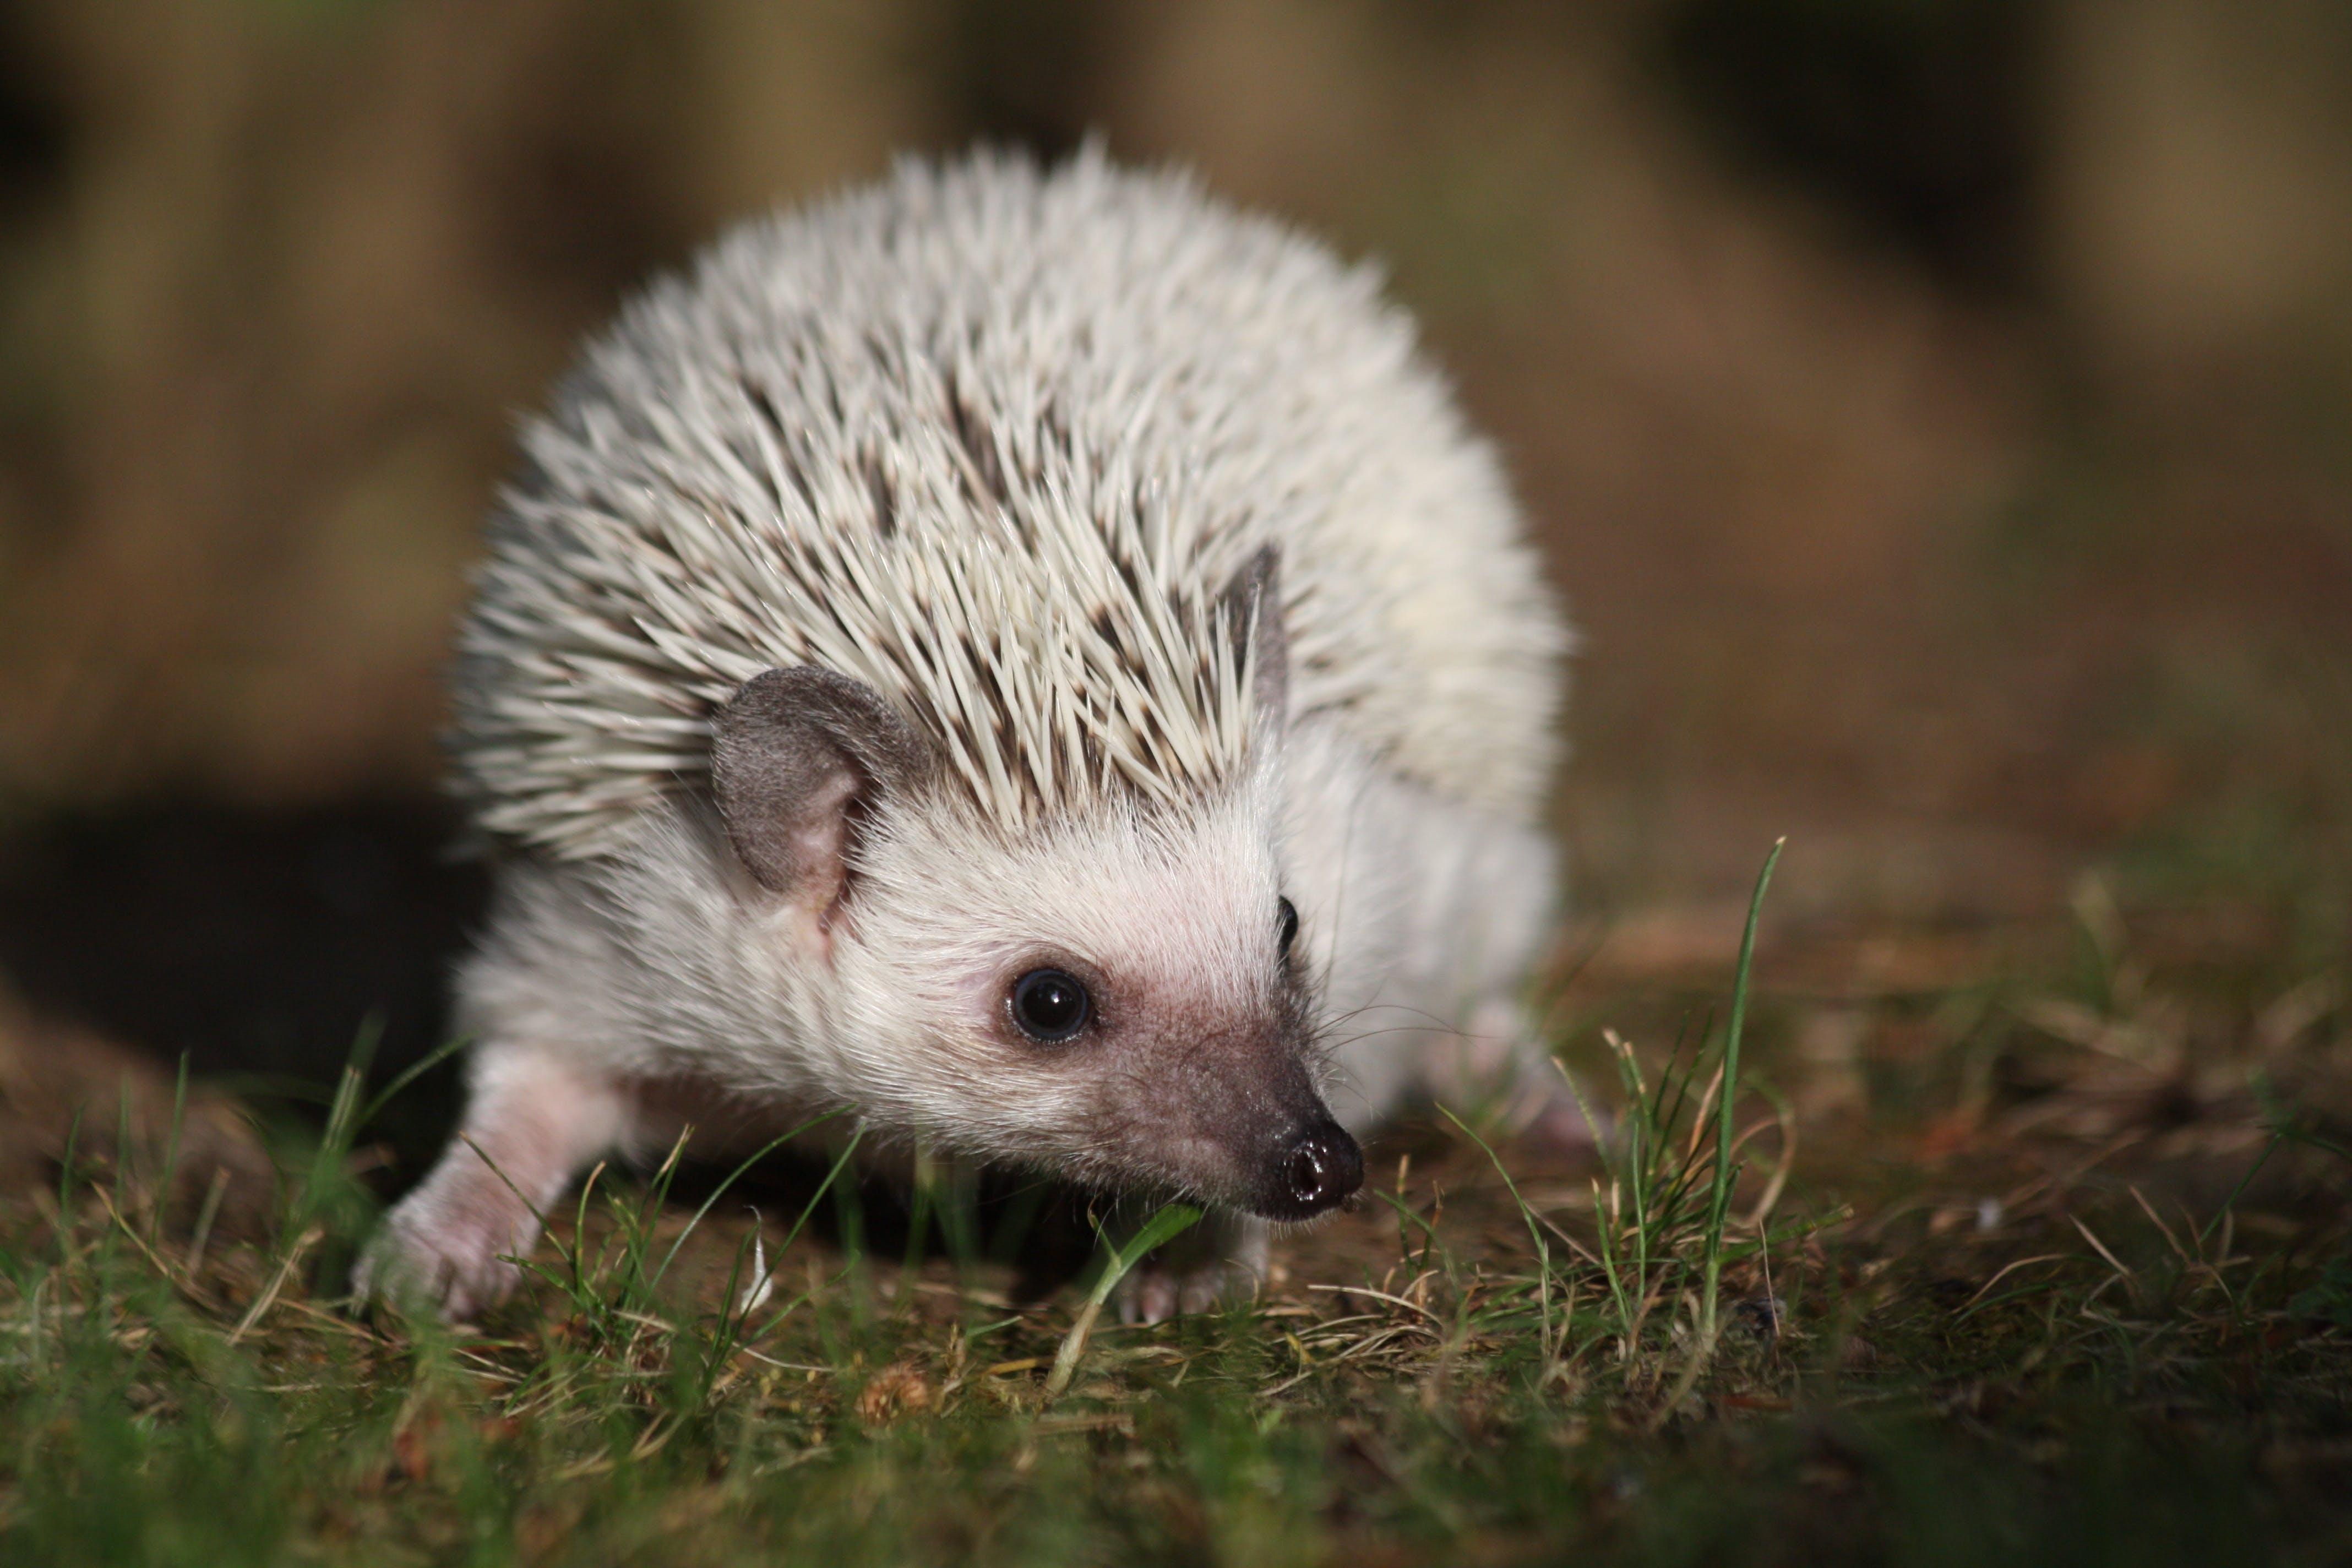 White Hedgehog in Grass